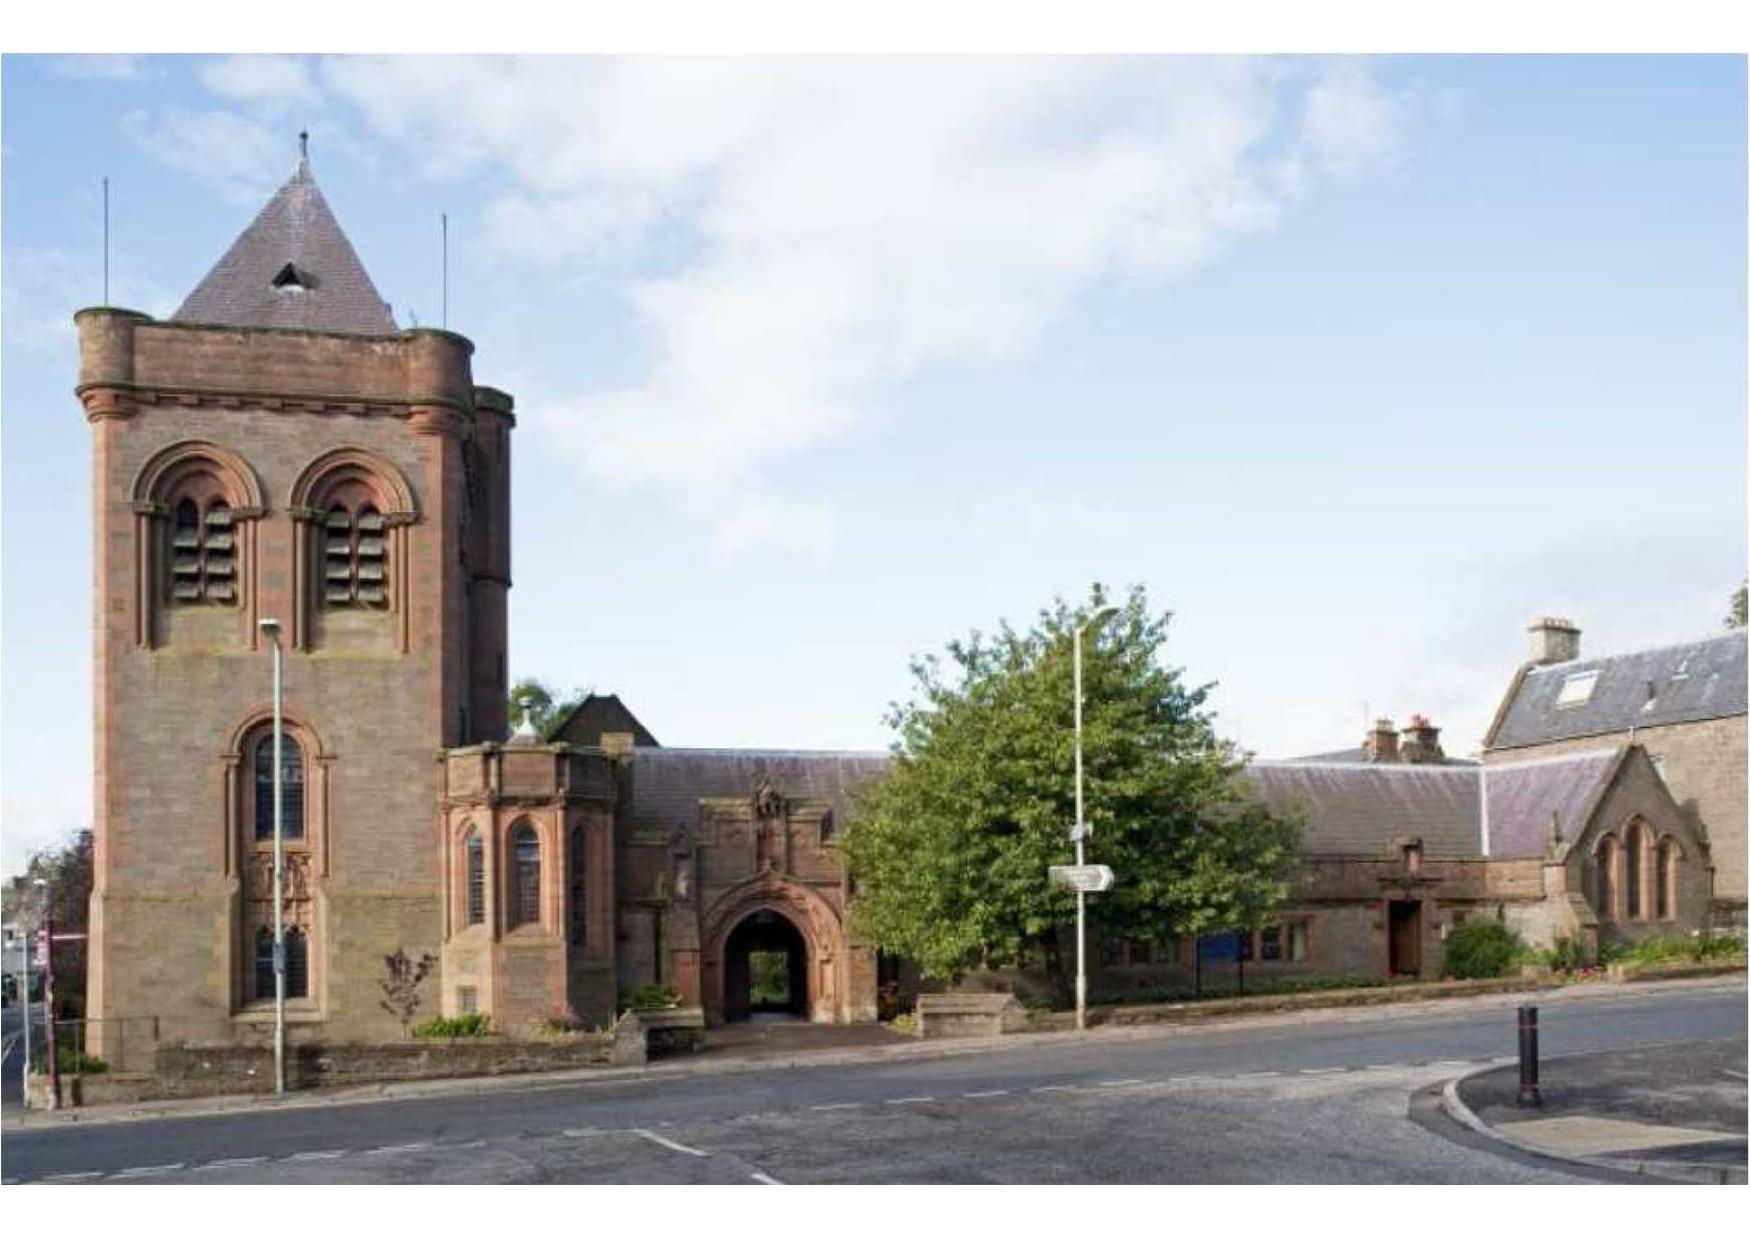 The Gardner Memorial Church in Brechin.